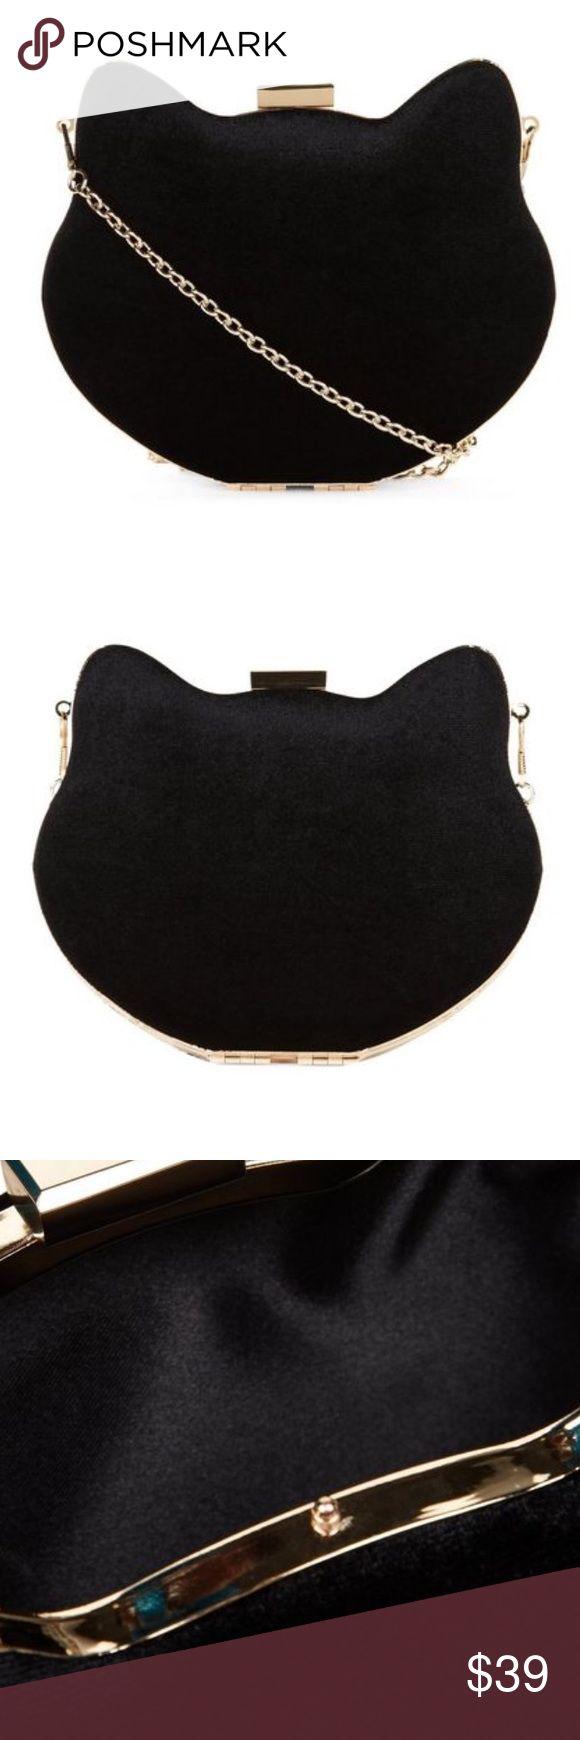 New Look  Black Cat Box Clutch Bag , - Cat design New Look  Black Cat Box Clutch Bag , - Cat design- Gold trim- Optional chain strap- Clip top fastening New Look Bags Mini Bags